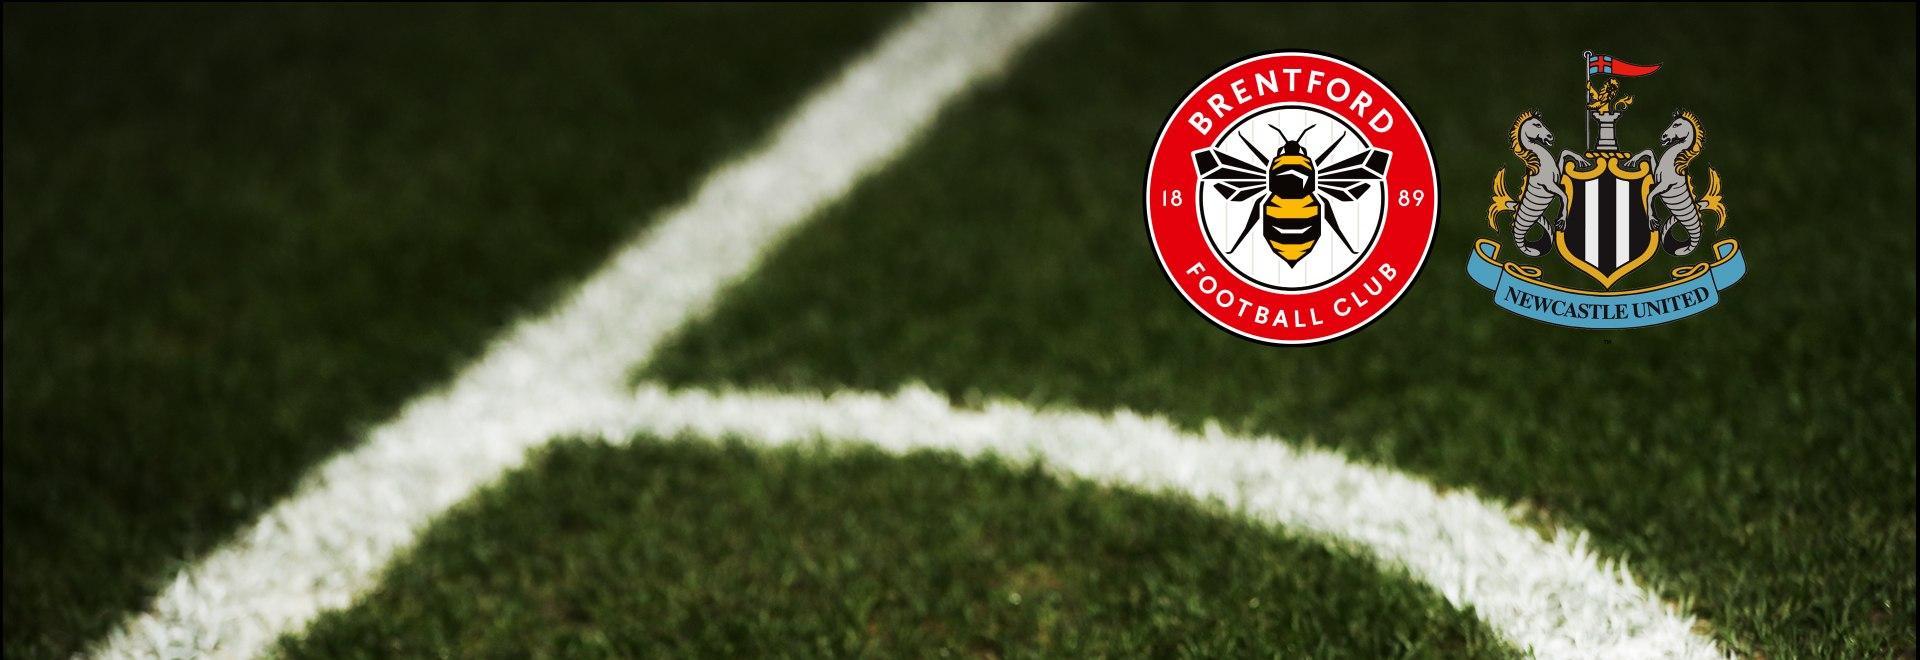 Brentford - Newcastle United